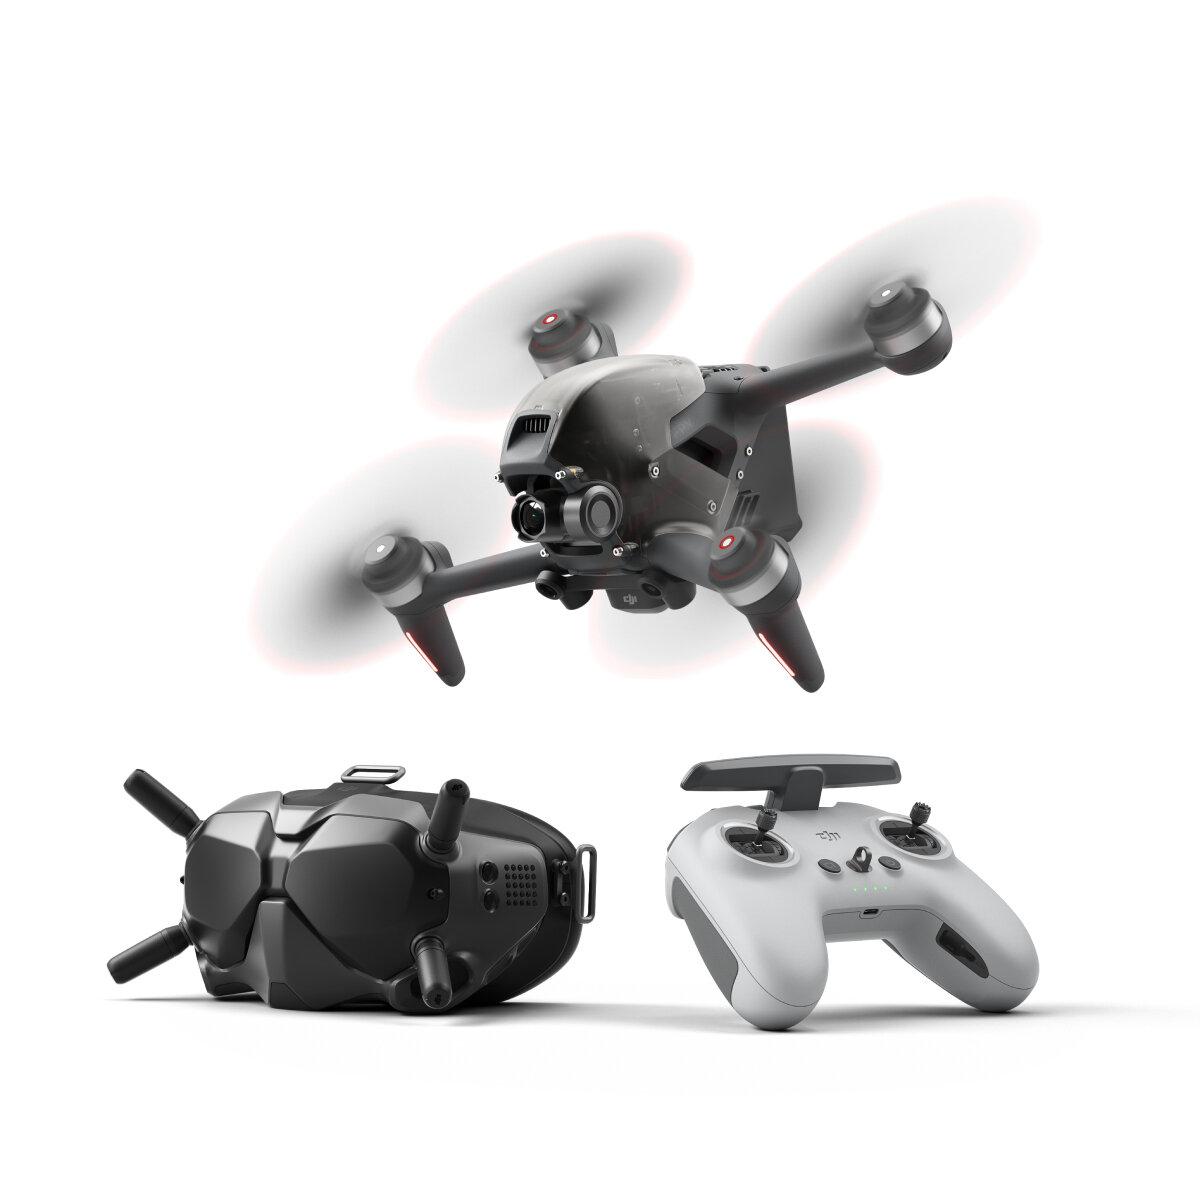 DJI FPV Combo 10KM 1080P FPV 4K 60fps Camera 20mins Flight Time 140 km/h Speed FPV Racing Drone RC Quadcopter FPV Goggles V2 5.8GHz Transmitter Mode2